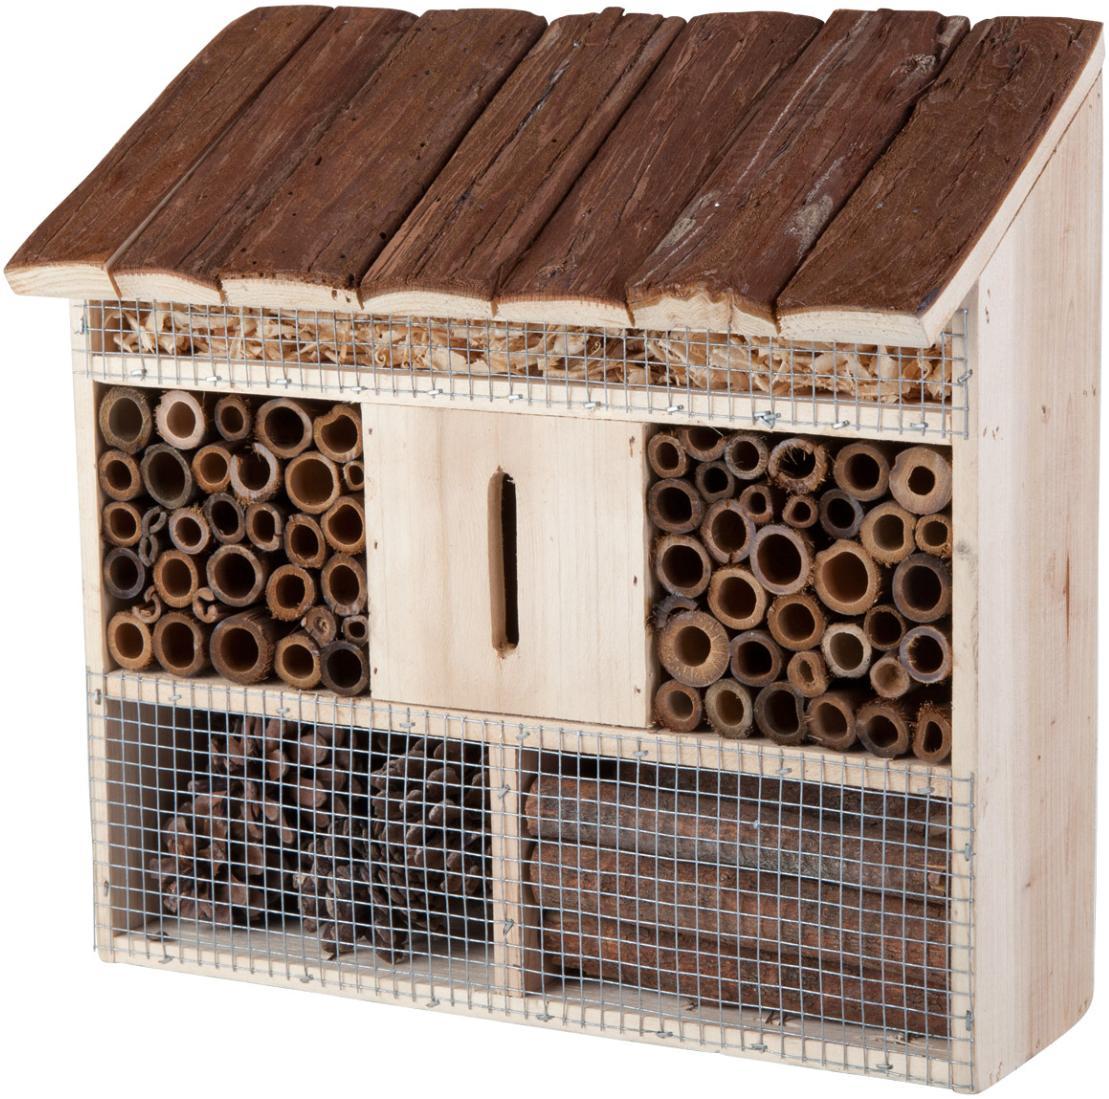 insektenhotel aus holz g nstig kaufen im mifus online shop. Black Bedroom Furniture Sets. Home Design Ideas